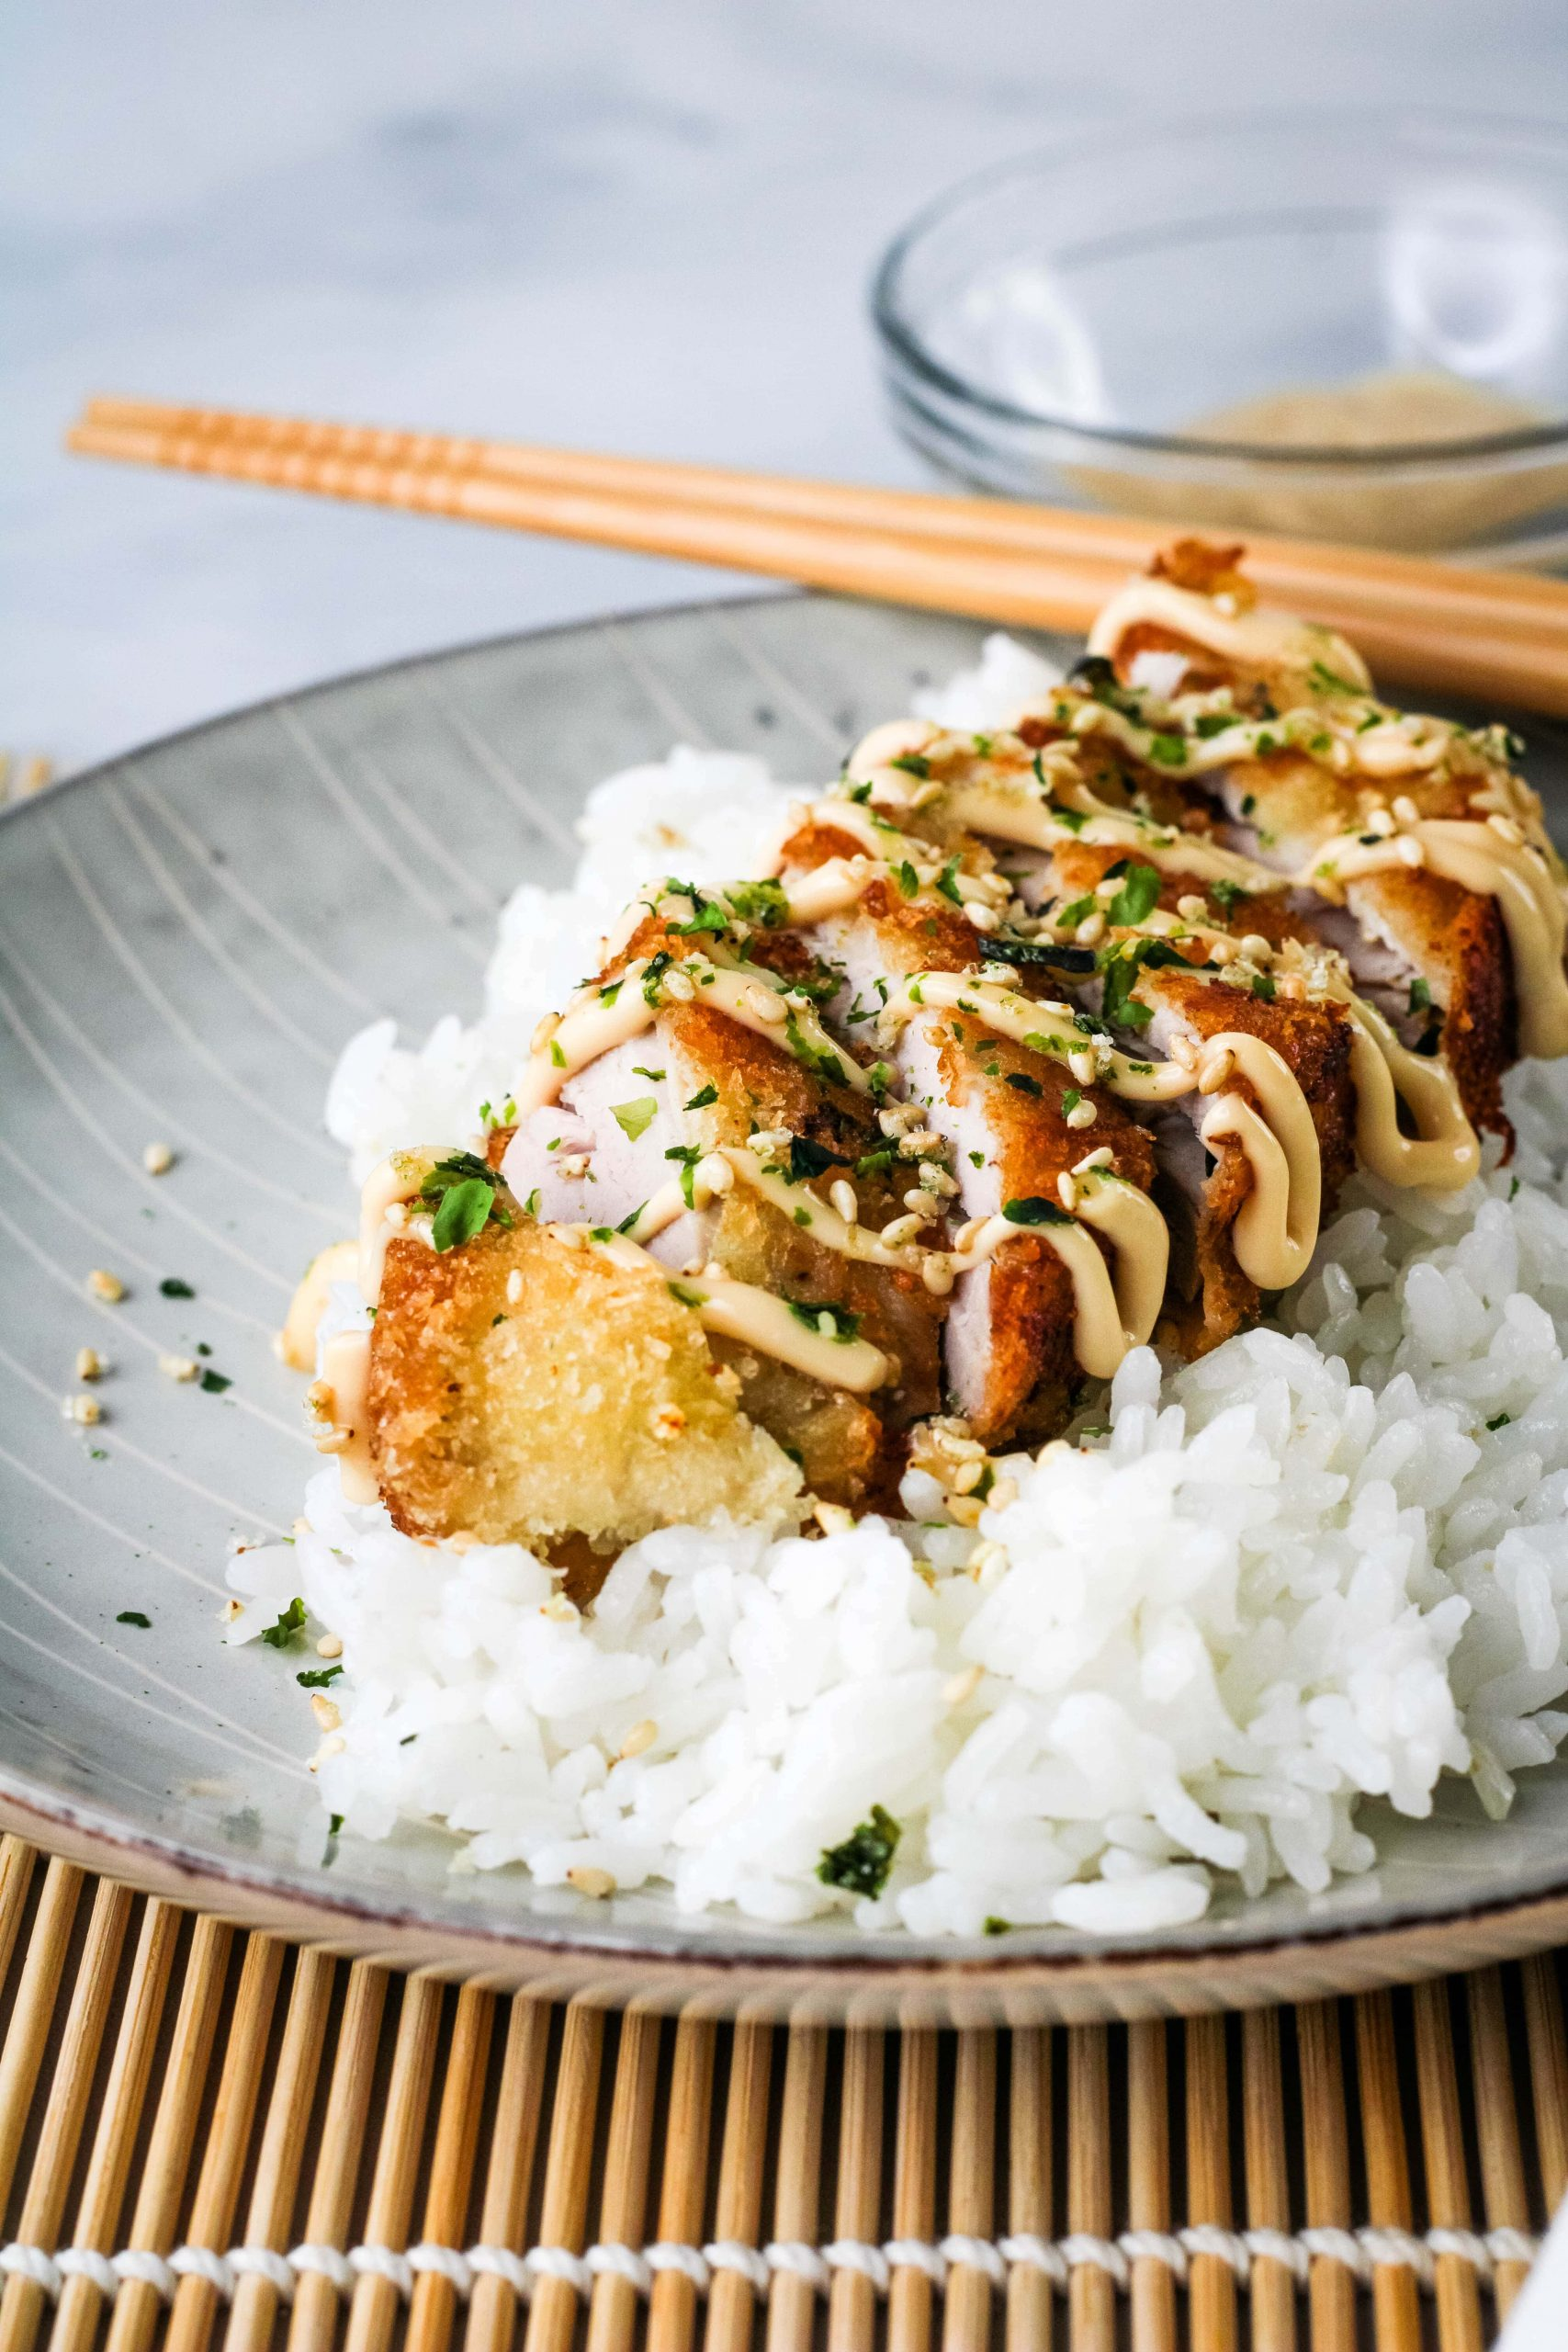 ahi katsu with unagi aioli with rice on a plate